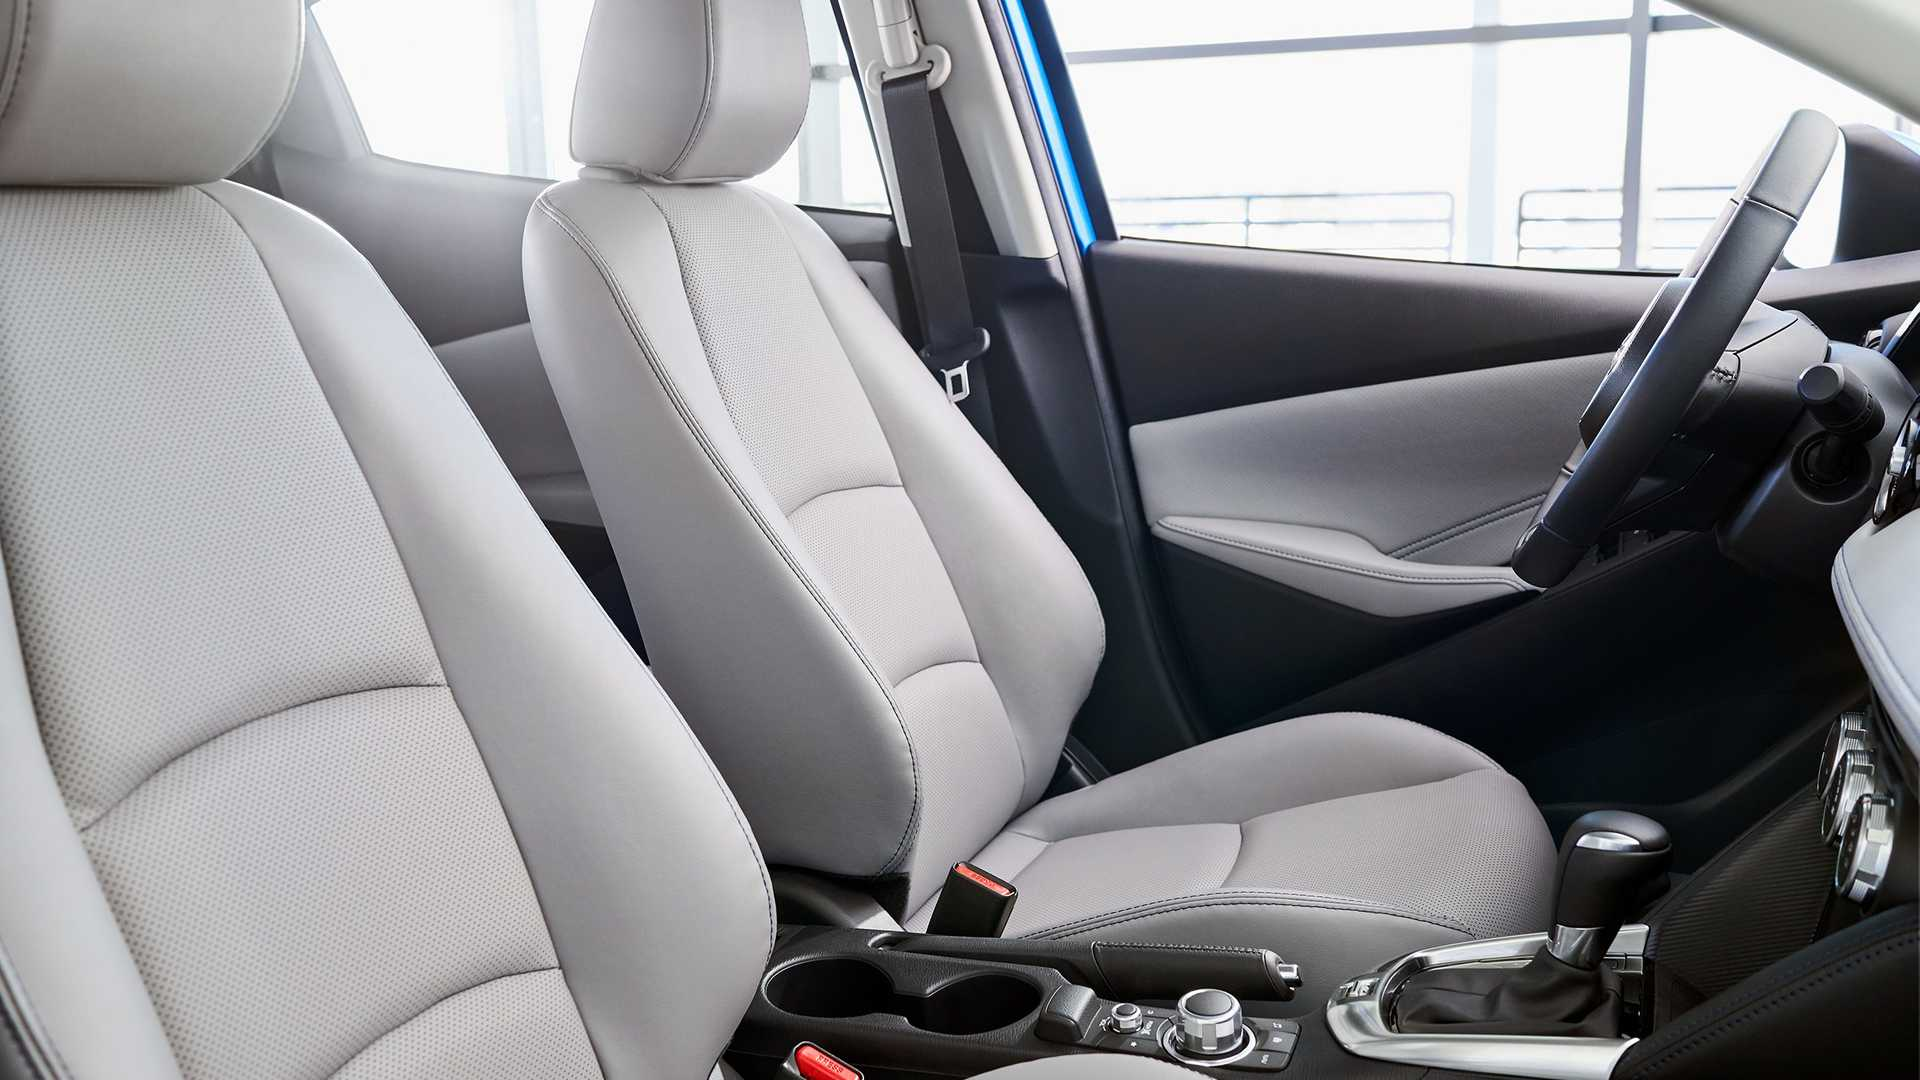 2020-toyota-yaris-hatchback-8.jpg